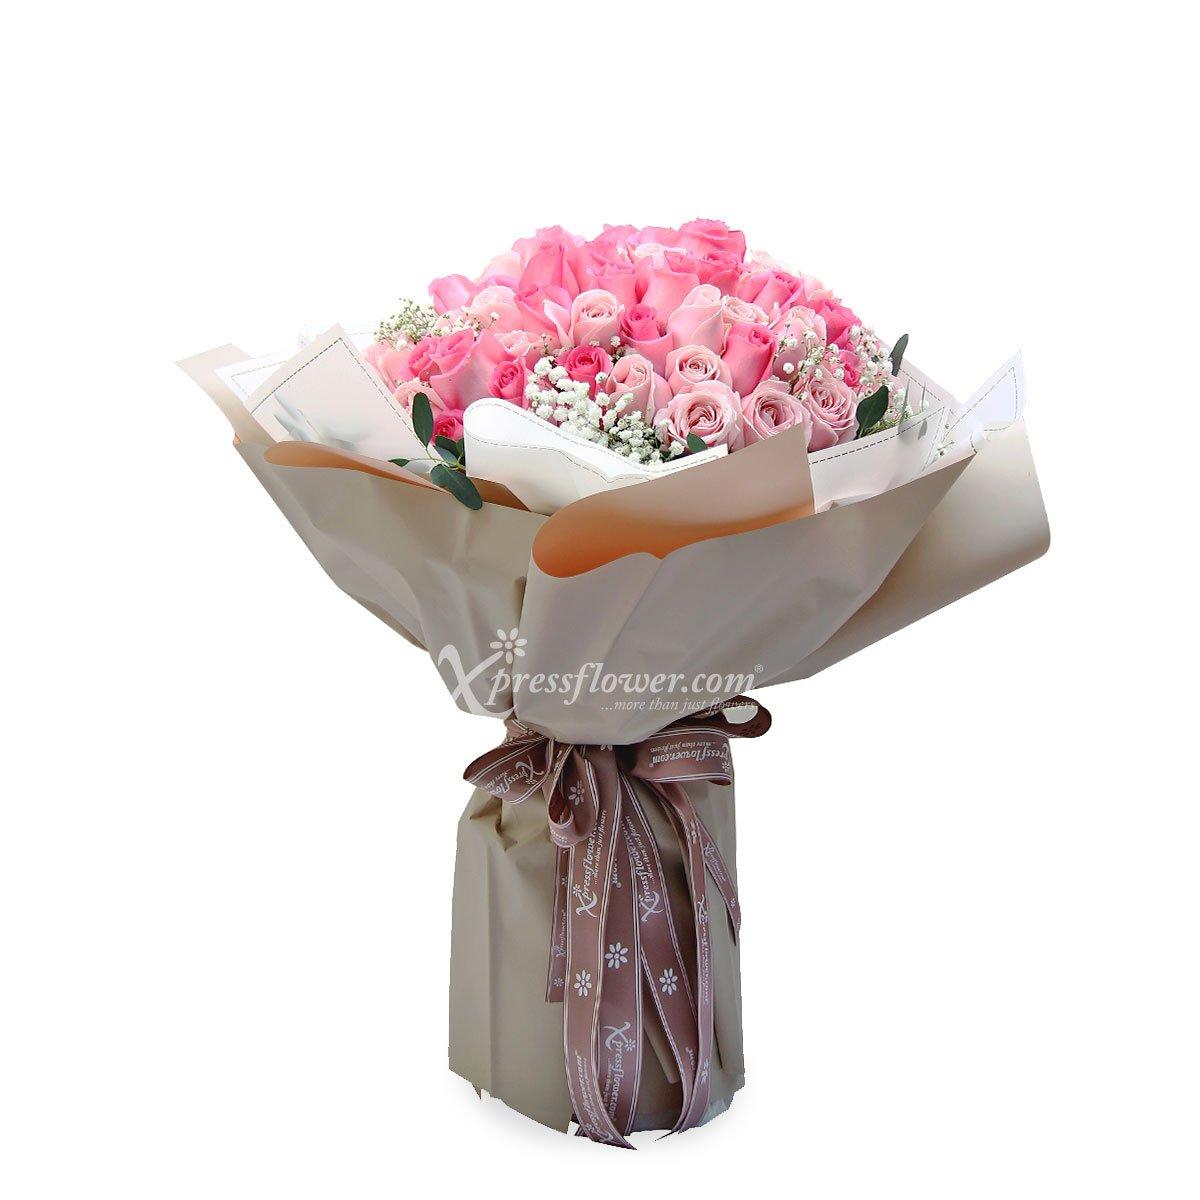 Million Reasons (99 stalks Mix Pink Roses)